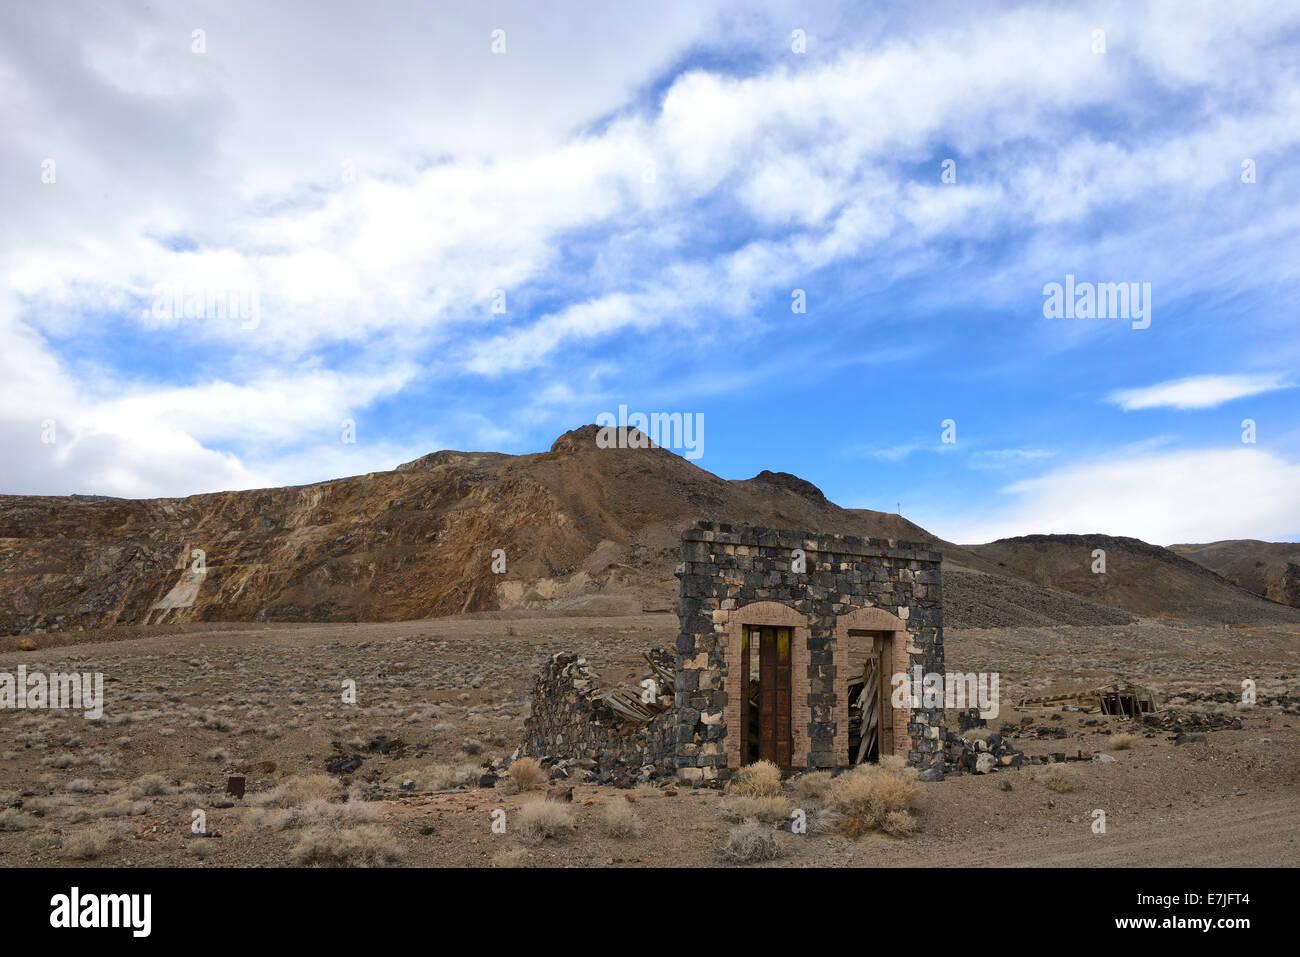 USA, United States, America, Nevada, Candelaria, Ghost town, history, Tonopah, mining, abandoned, americana, desolation, - Stock Image